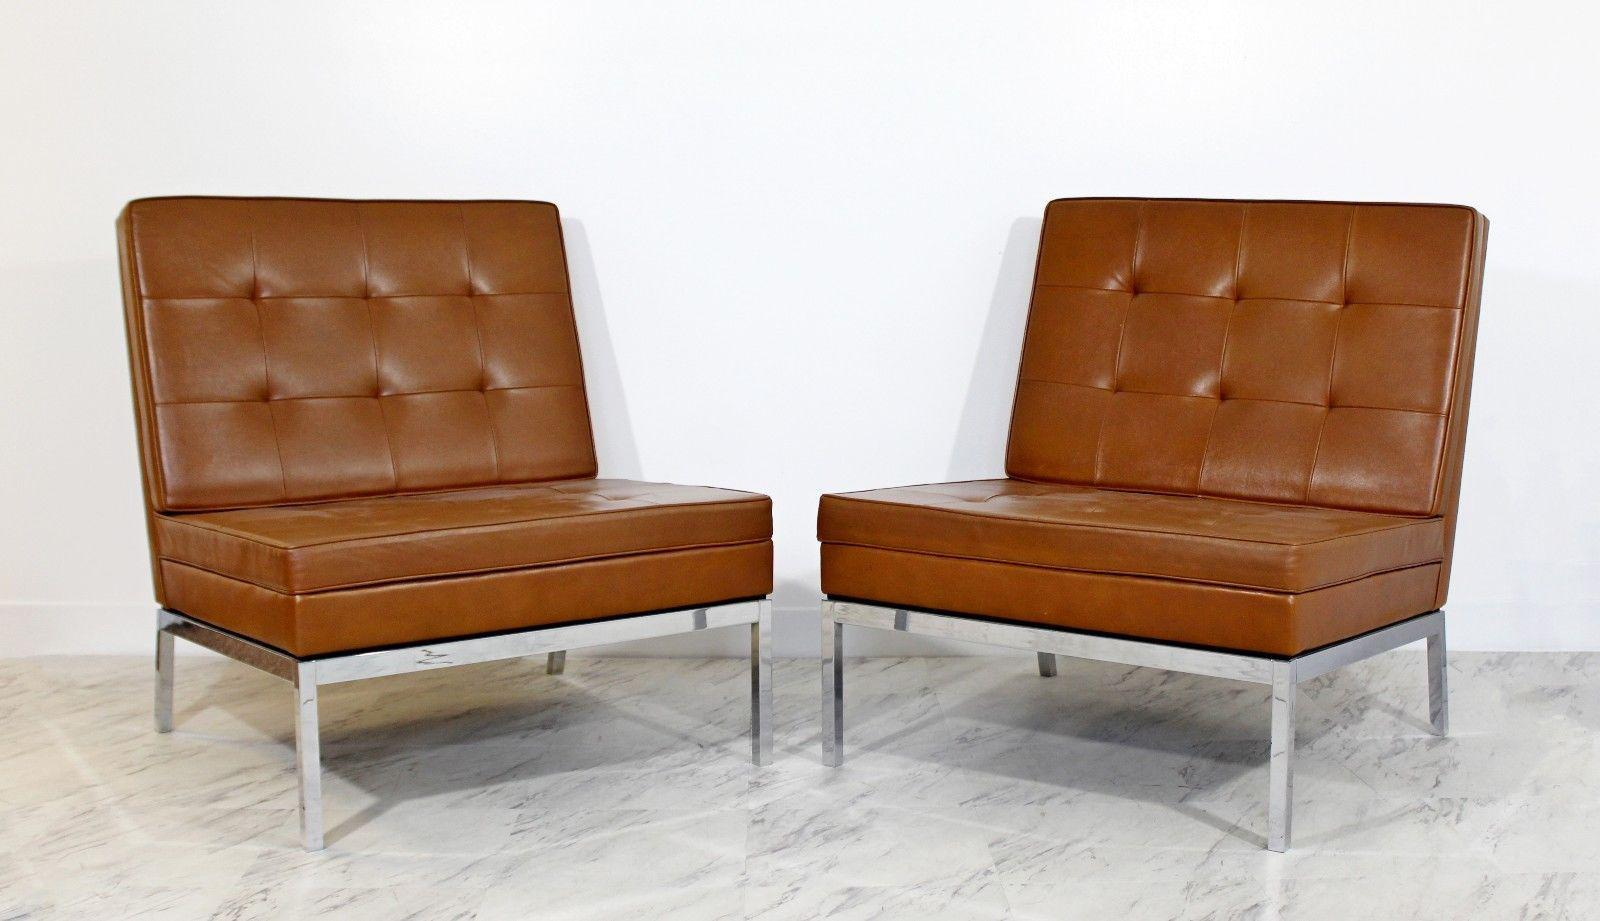 Superior Mid Century Modern Pair Vintage Knoll Chrome Leather